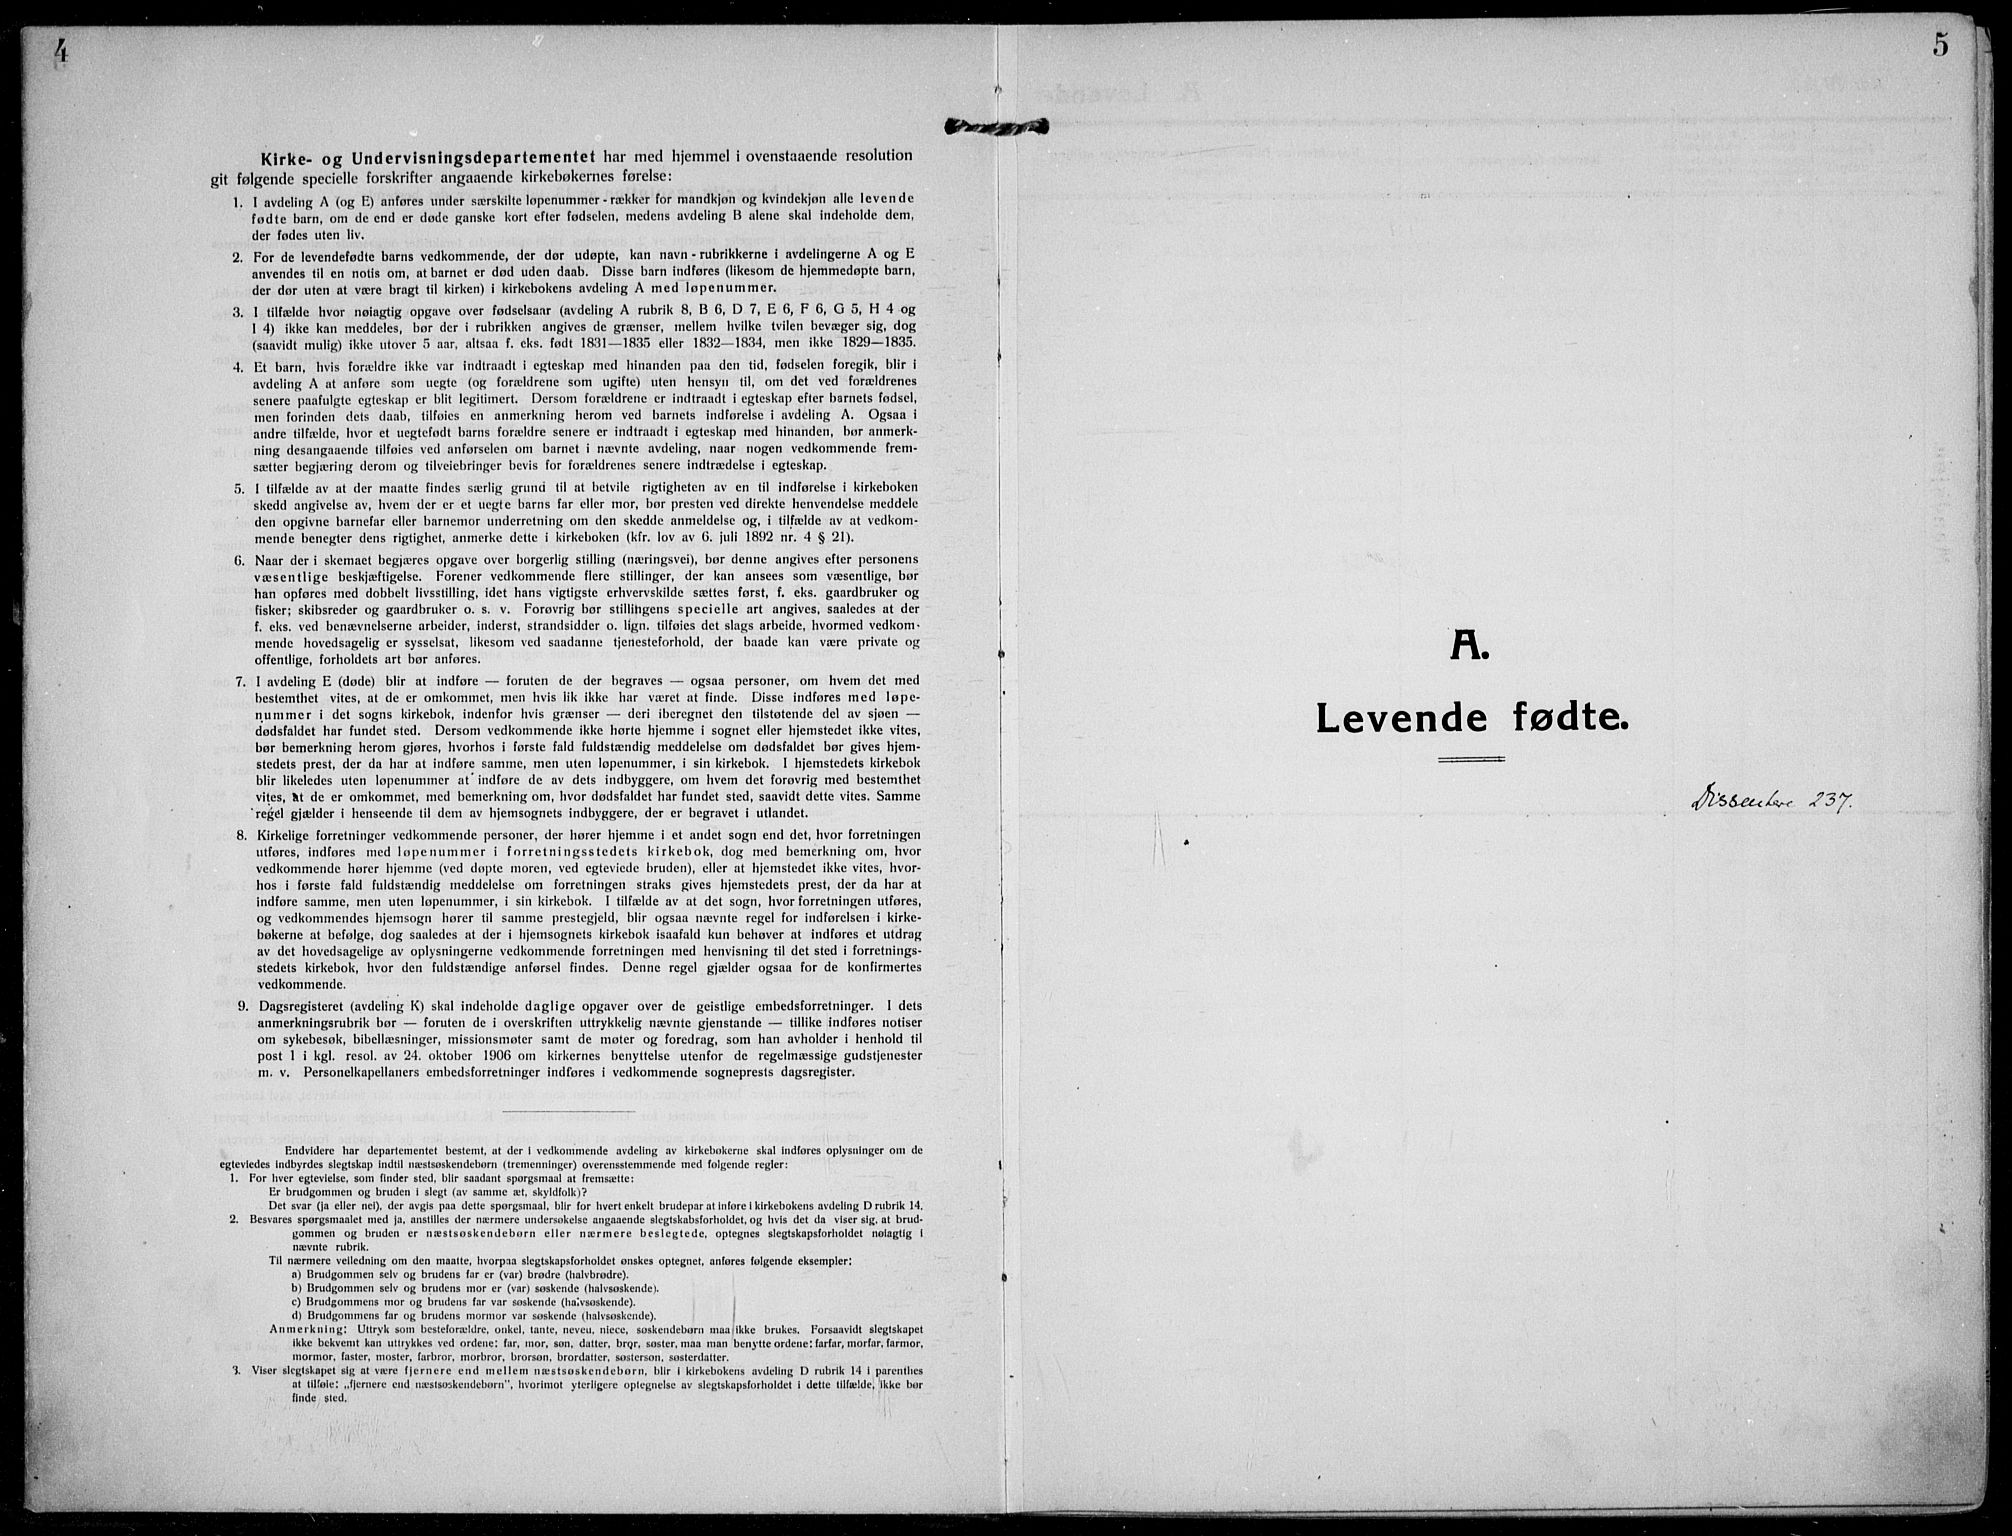 SAKO, Solum kirkebøker, F/Fb/L0004: Ministerialbok nr. II 4, 1913-1924, s. 4-5